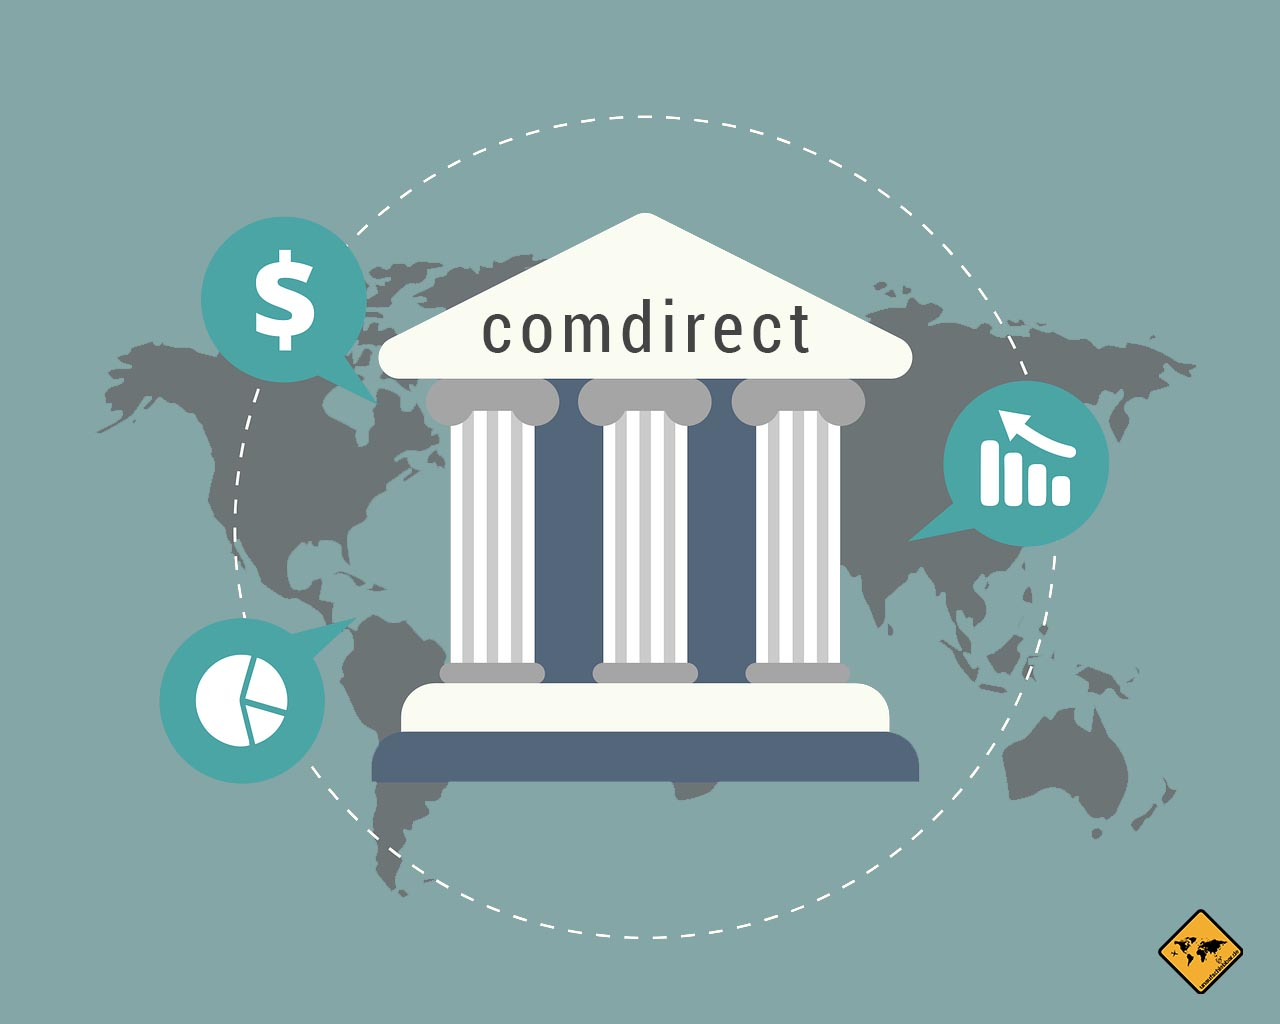 Bankkonto Kreditkarte digitale Nomaden comdirect